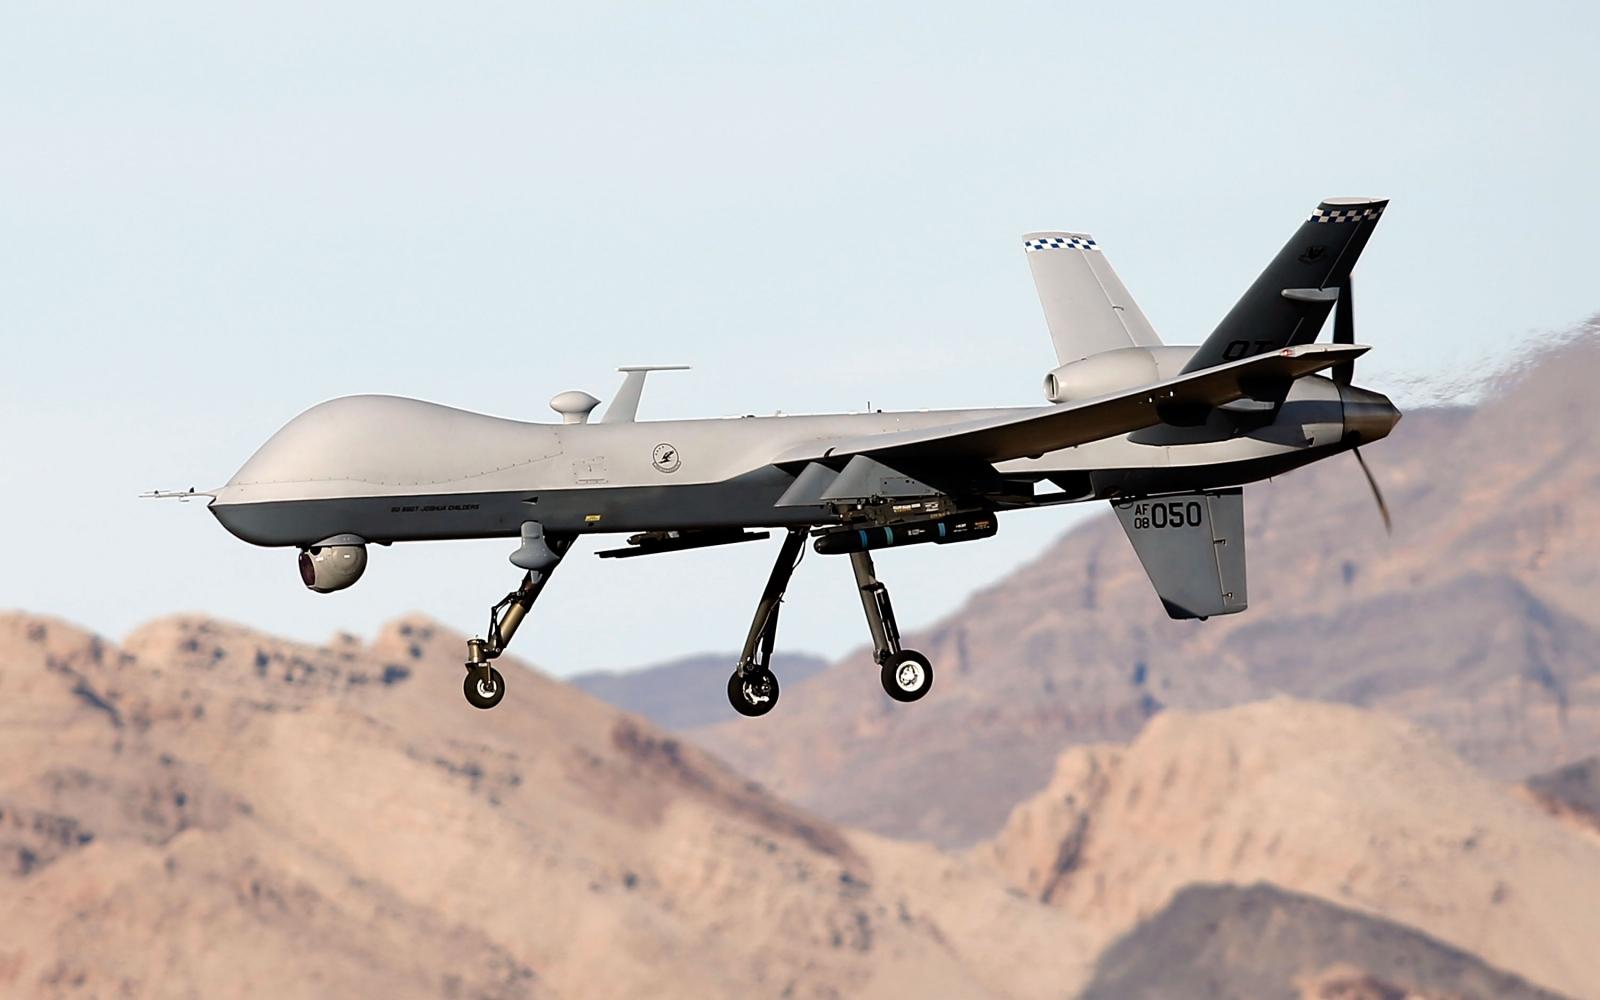 MQ-9 Reaper US Air Force military drone